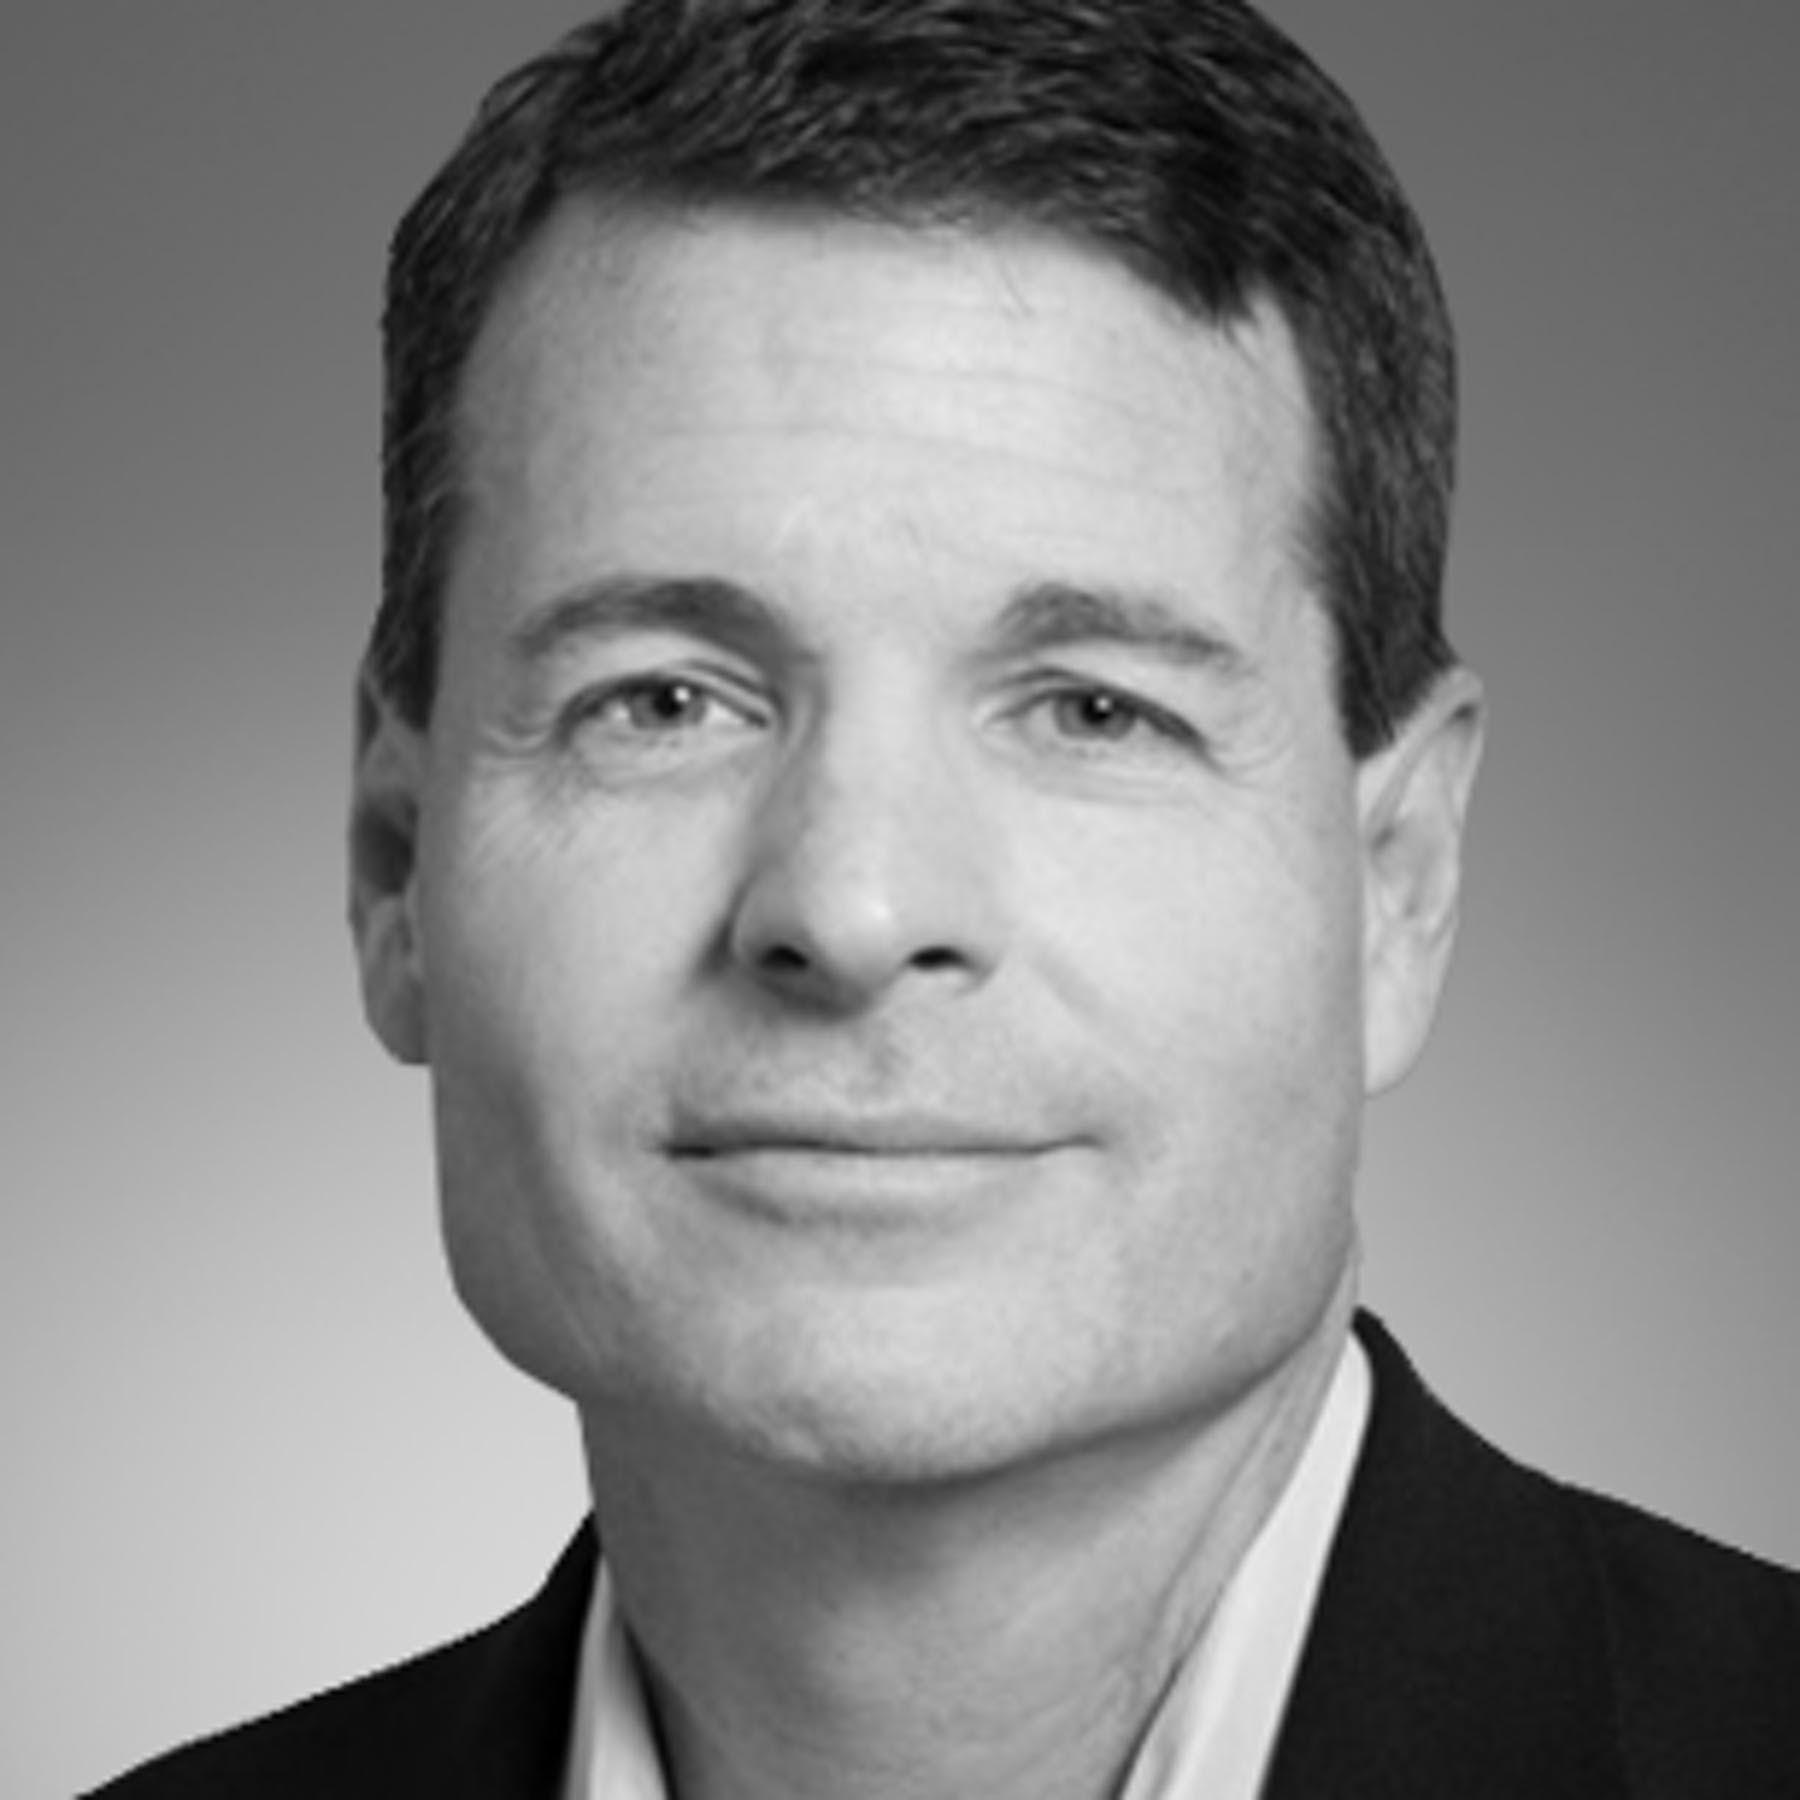 Gregg Hampton